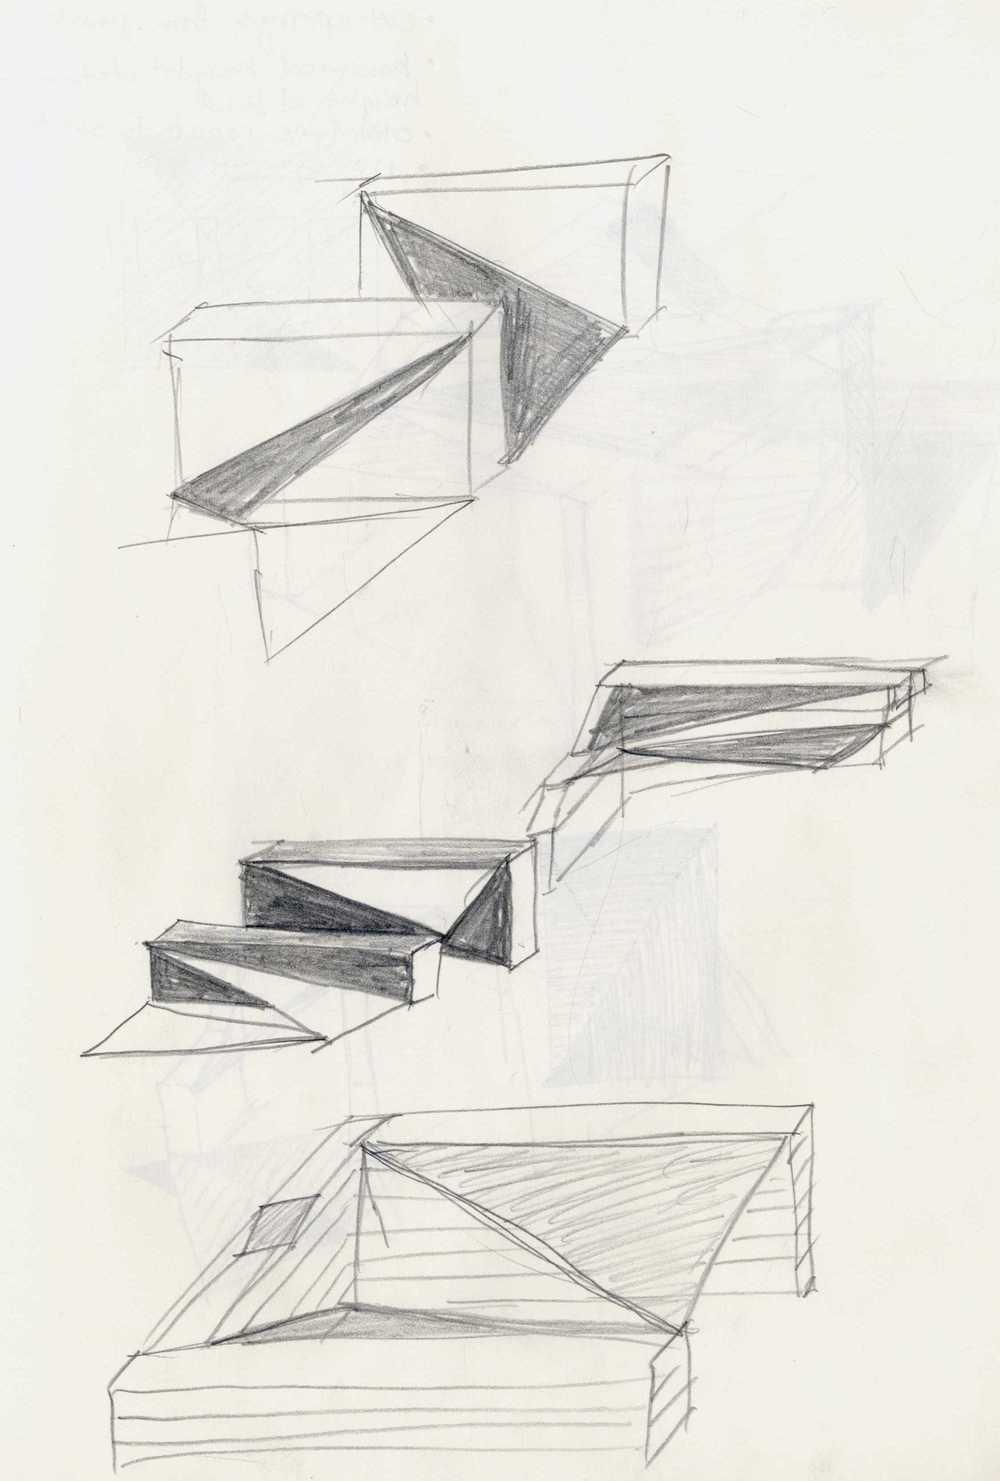 Component Sketch